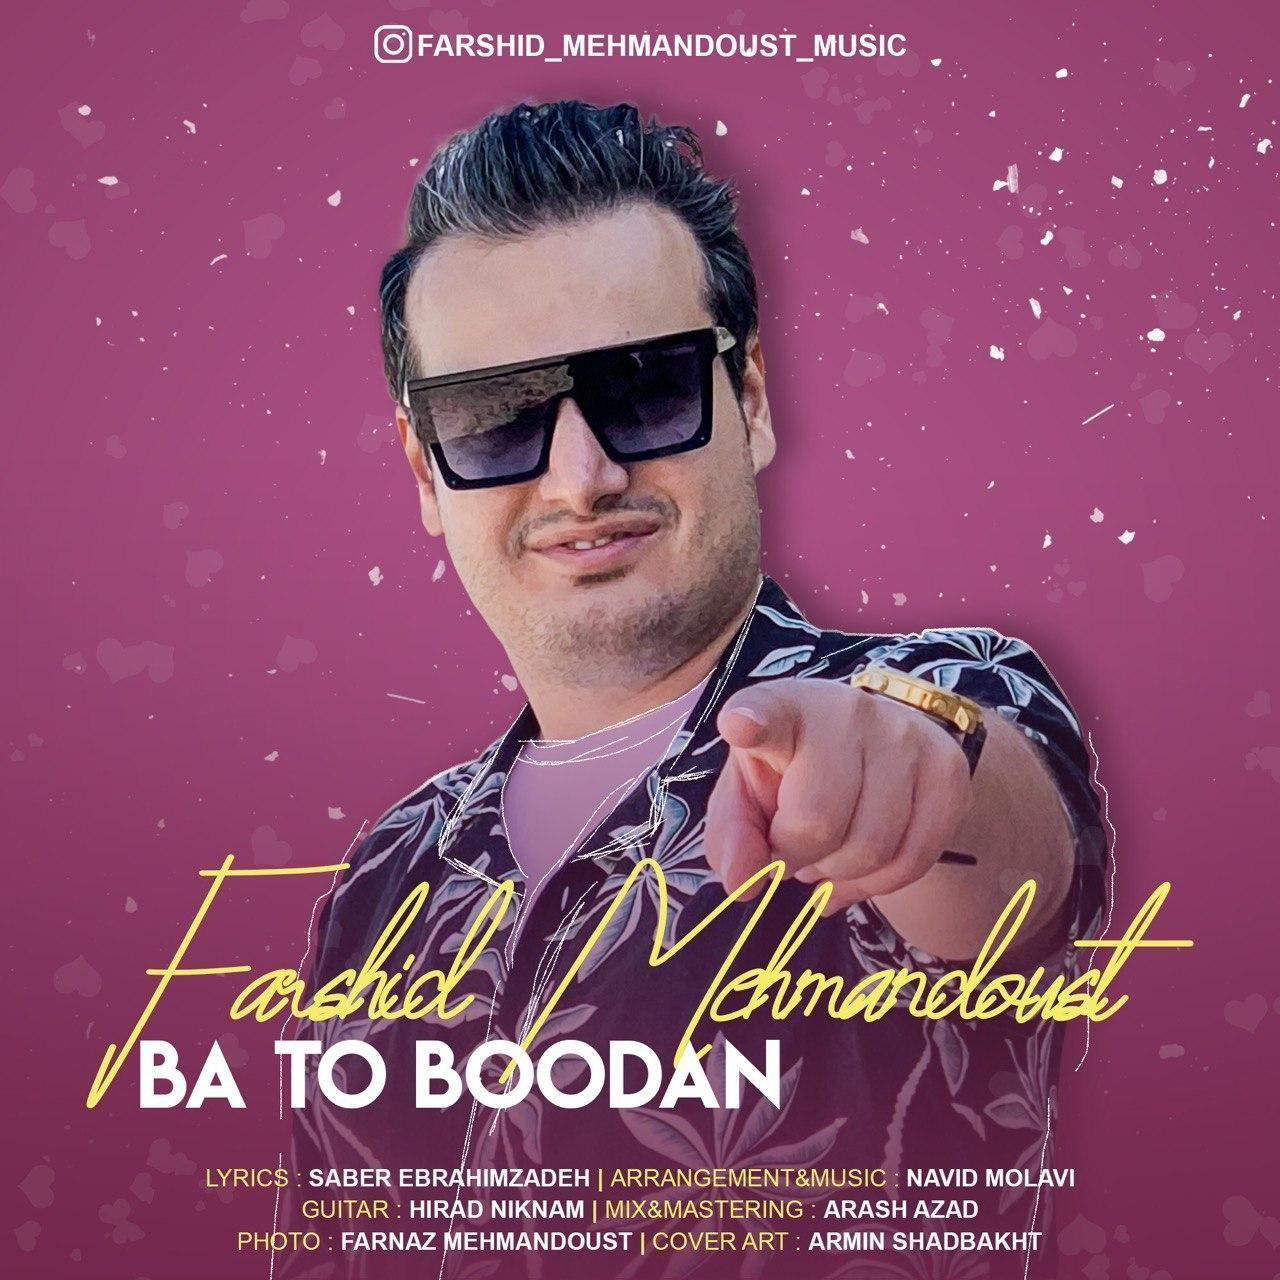 Farshid Mehmandoust – Ba To Boodan